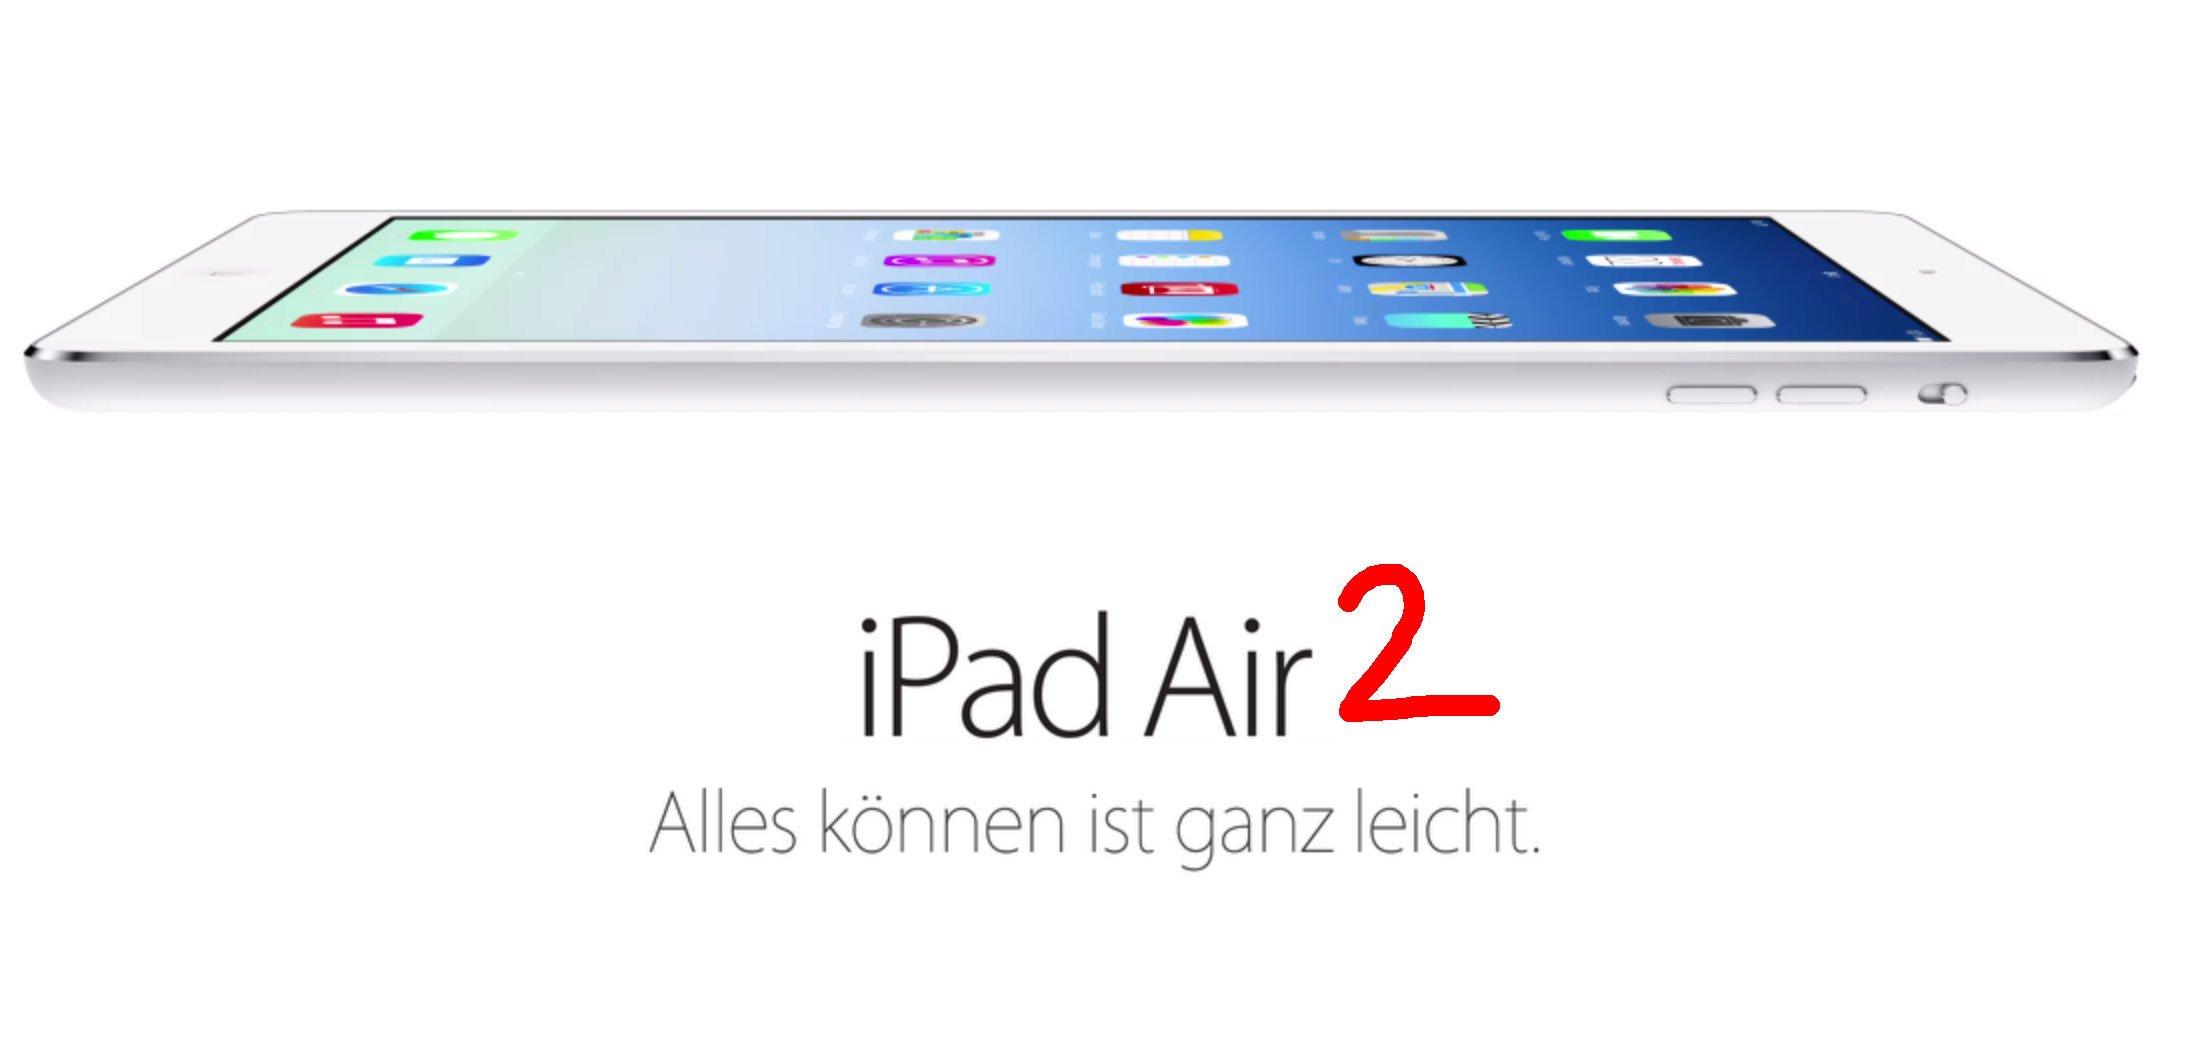 Apple iPad Air 2 Keynote doch früher? 1